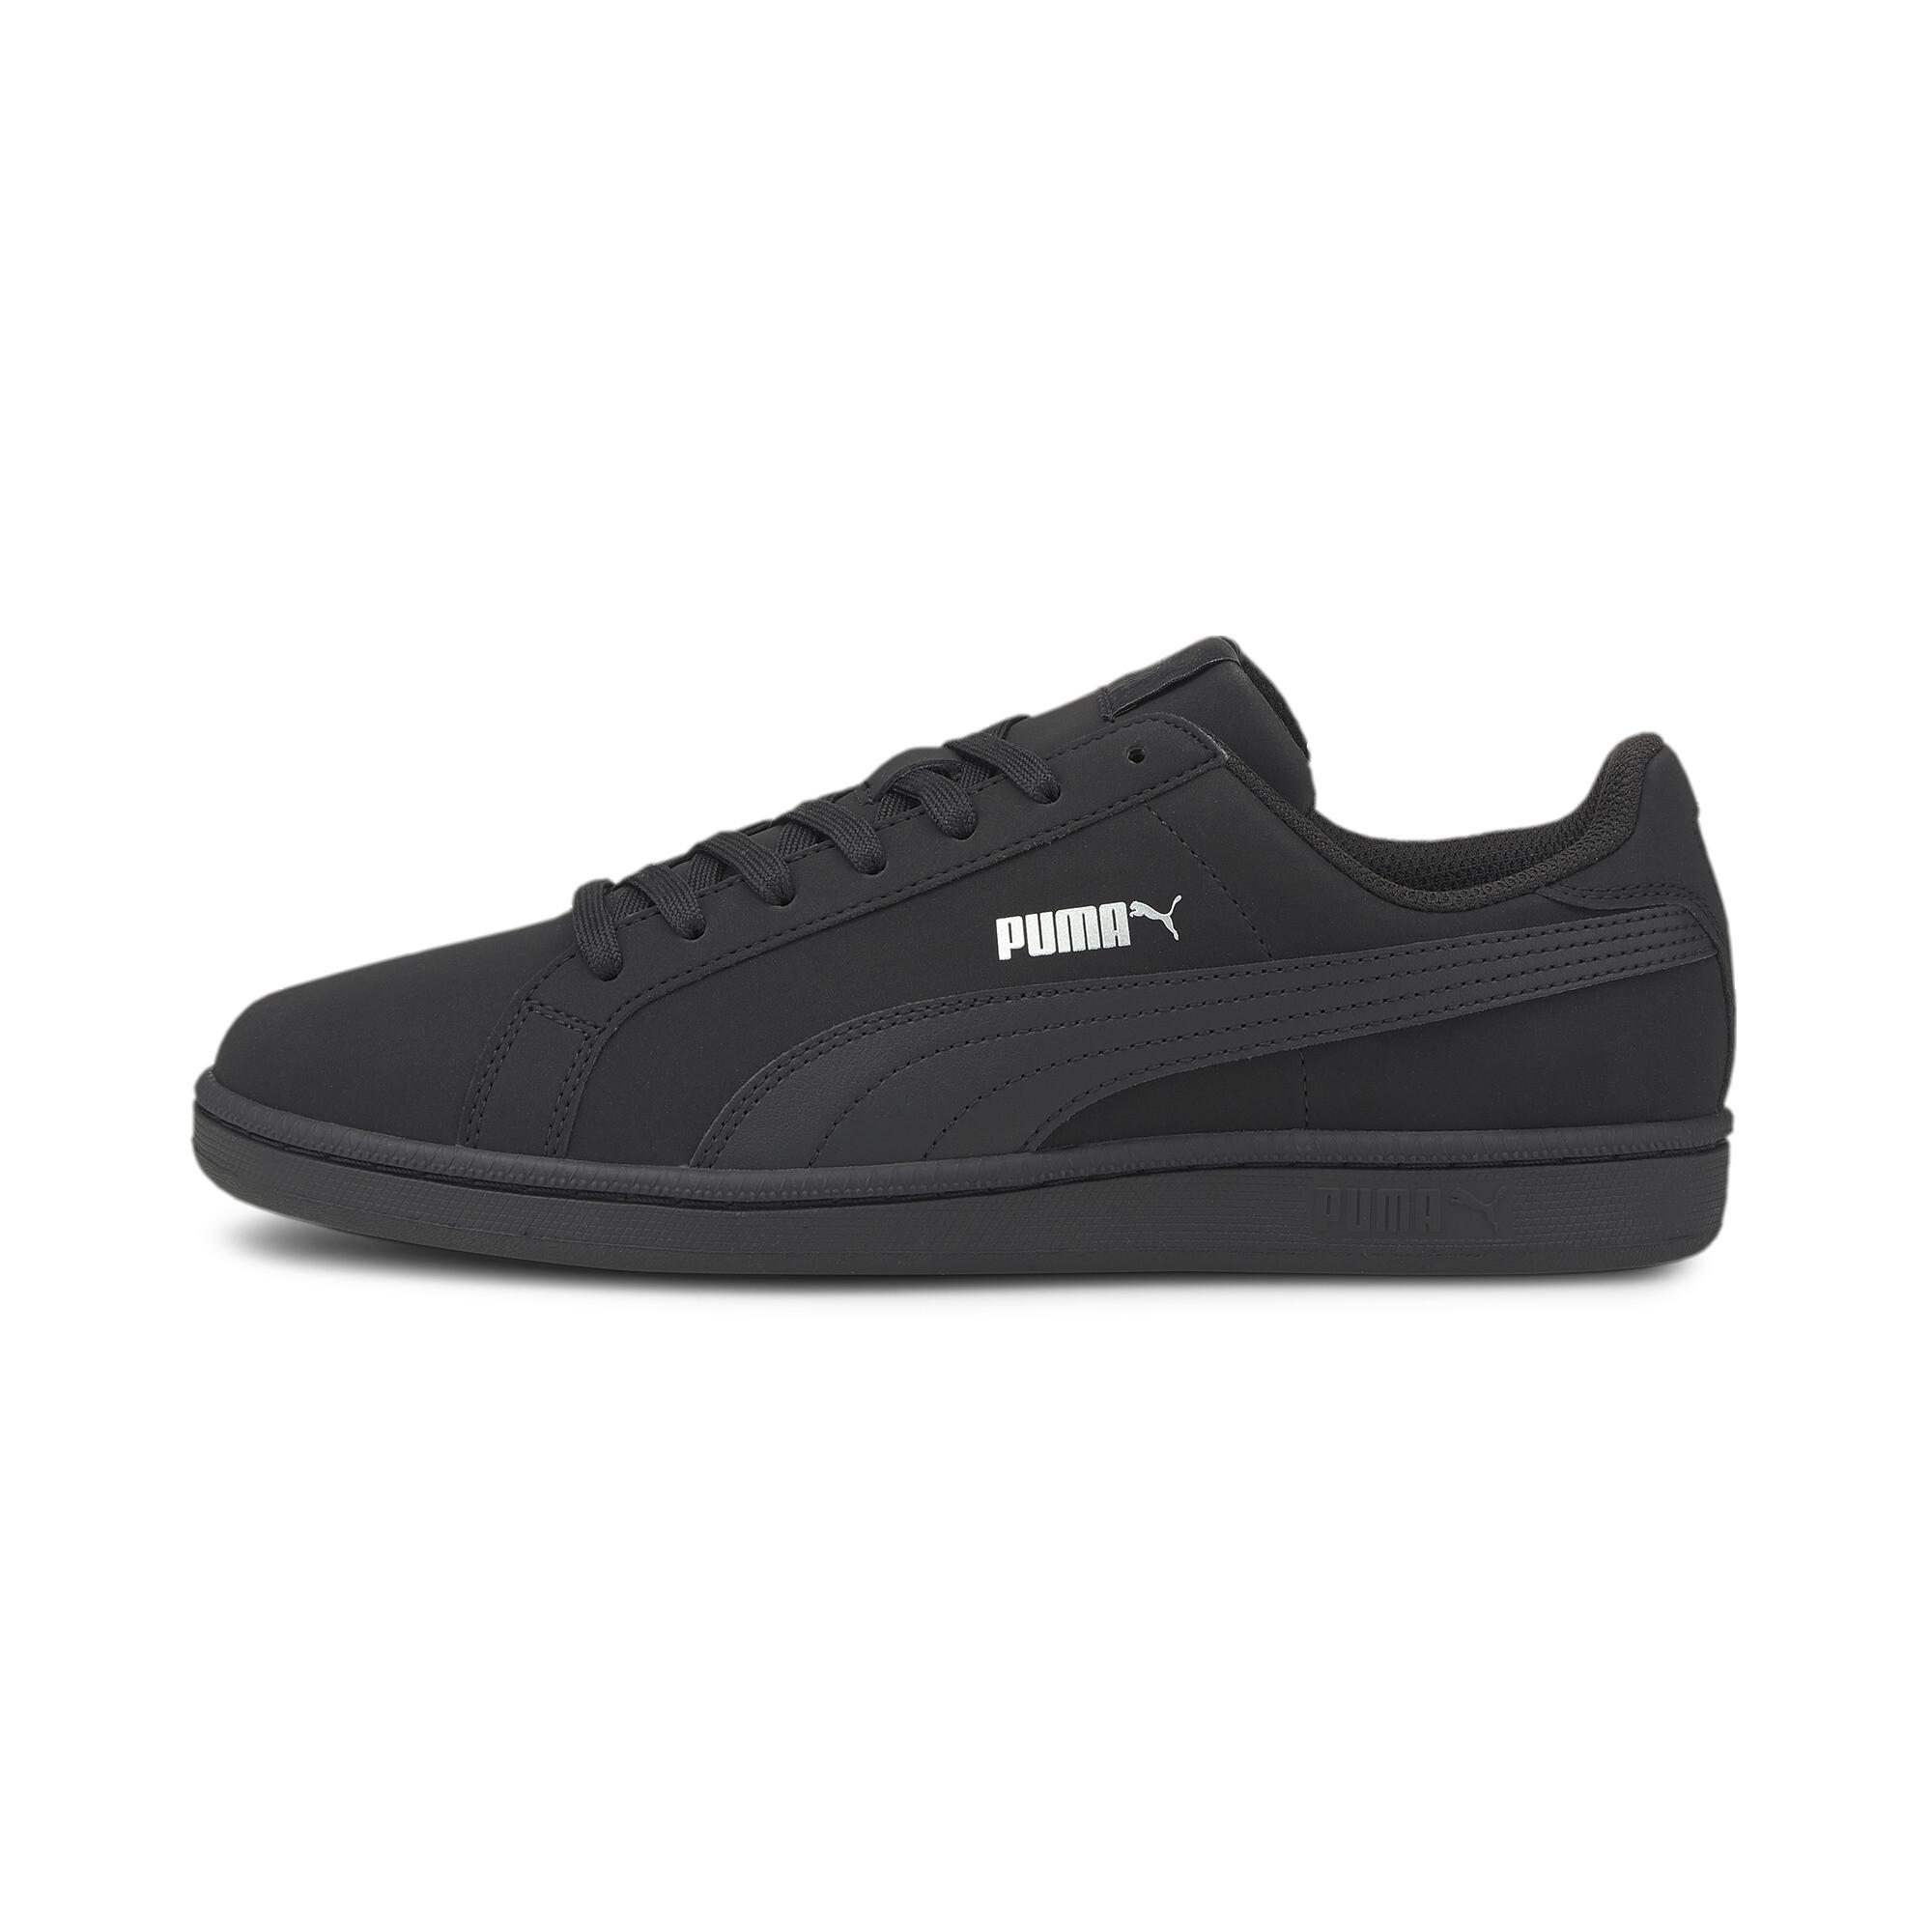 Indexbild 9 - PUMA Smash Buck Sneaker Unisex Schuhe Sport Classics Neu